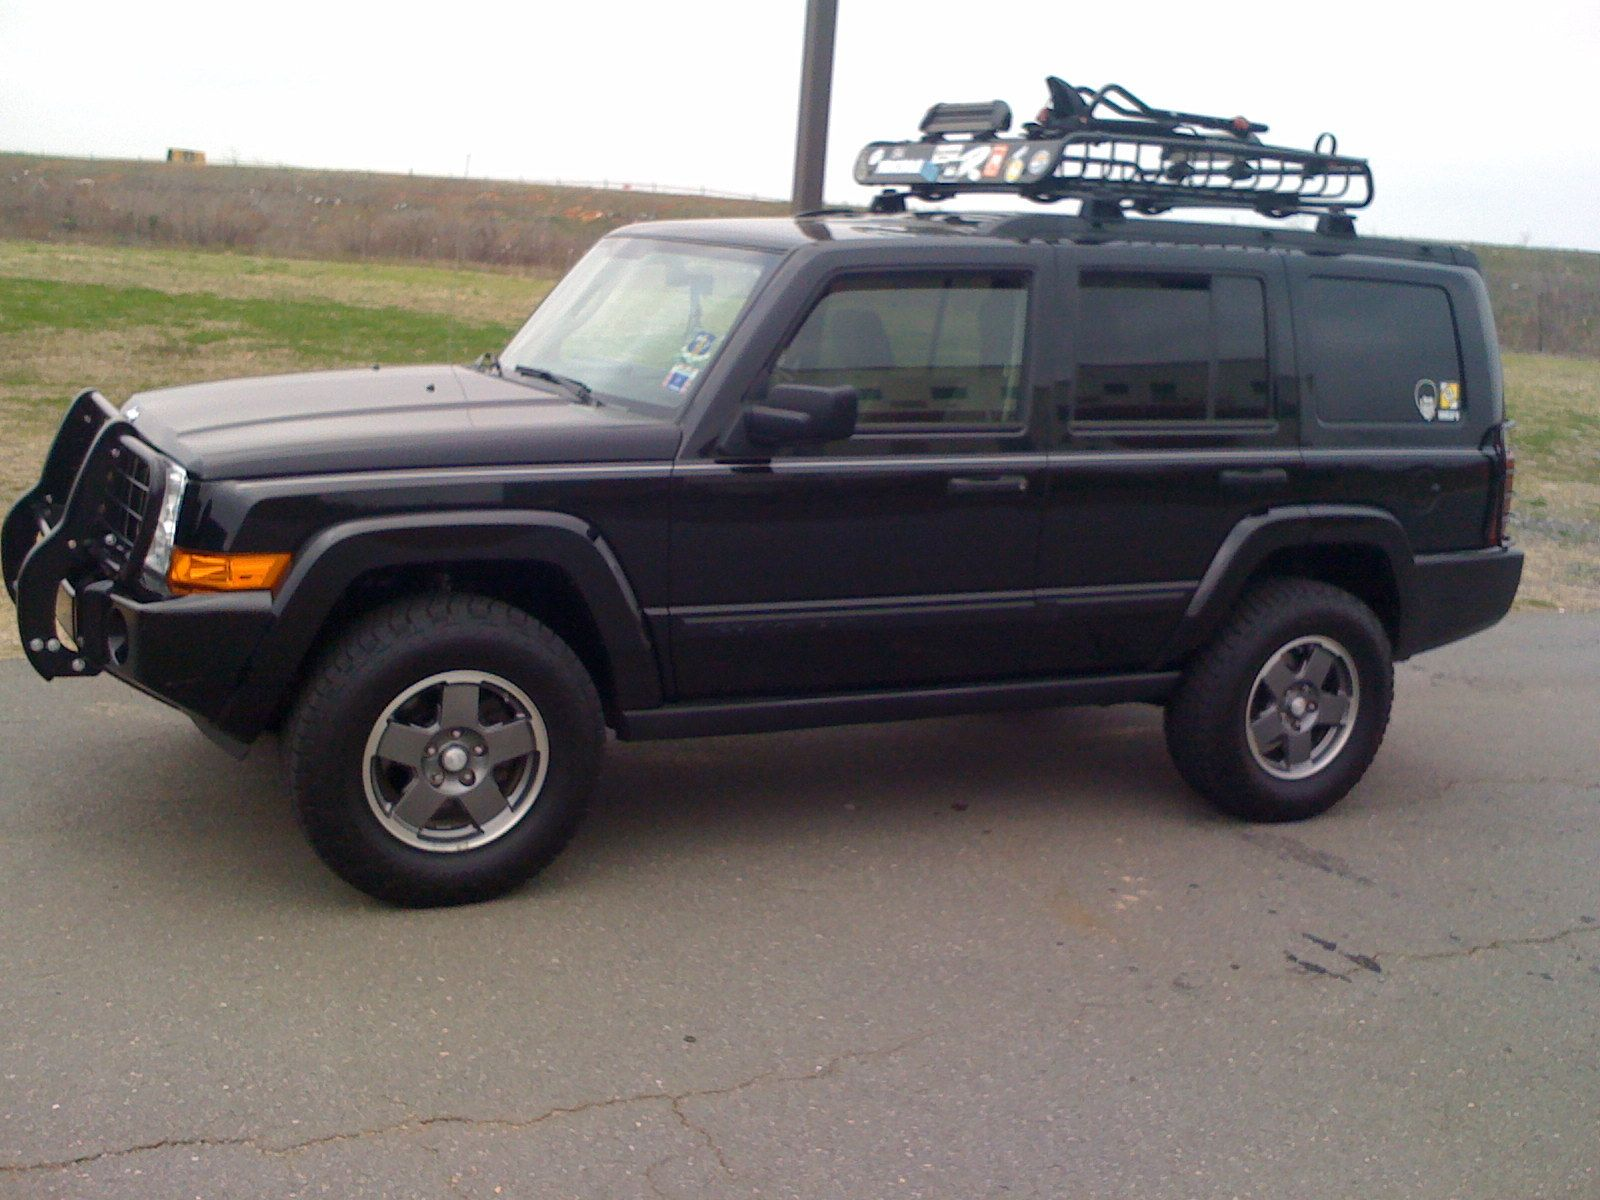 jeep commander off road parts jpeg http carimagescolay. Black Bedroom Furniture Sets. Home Design Ideas